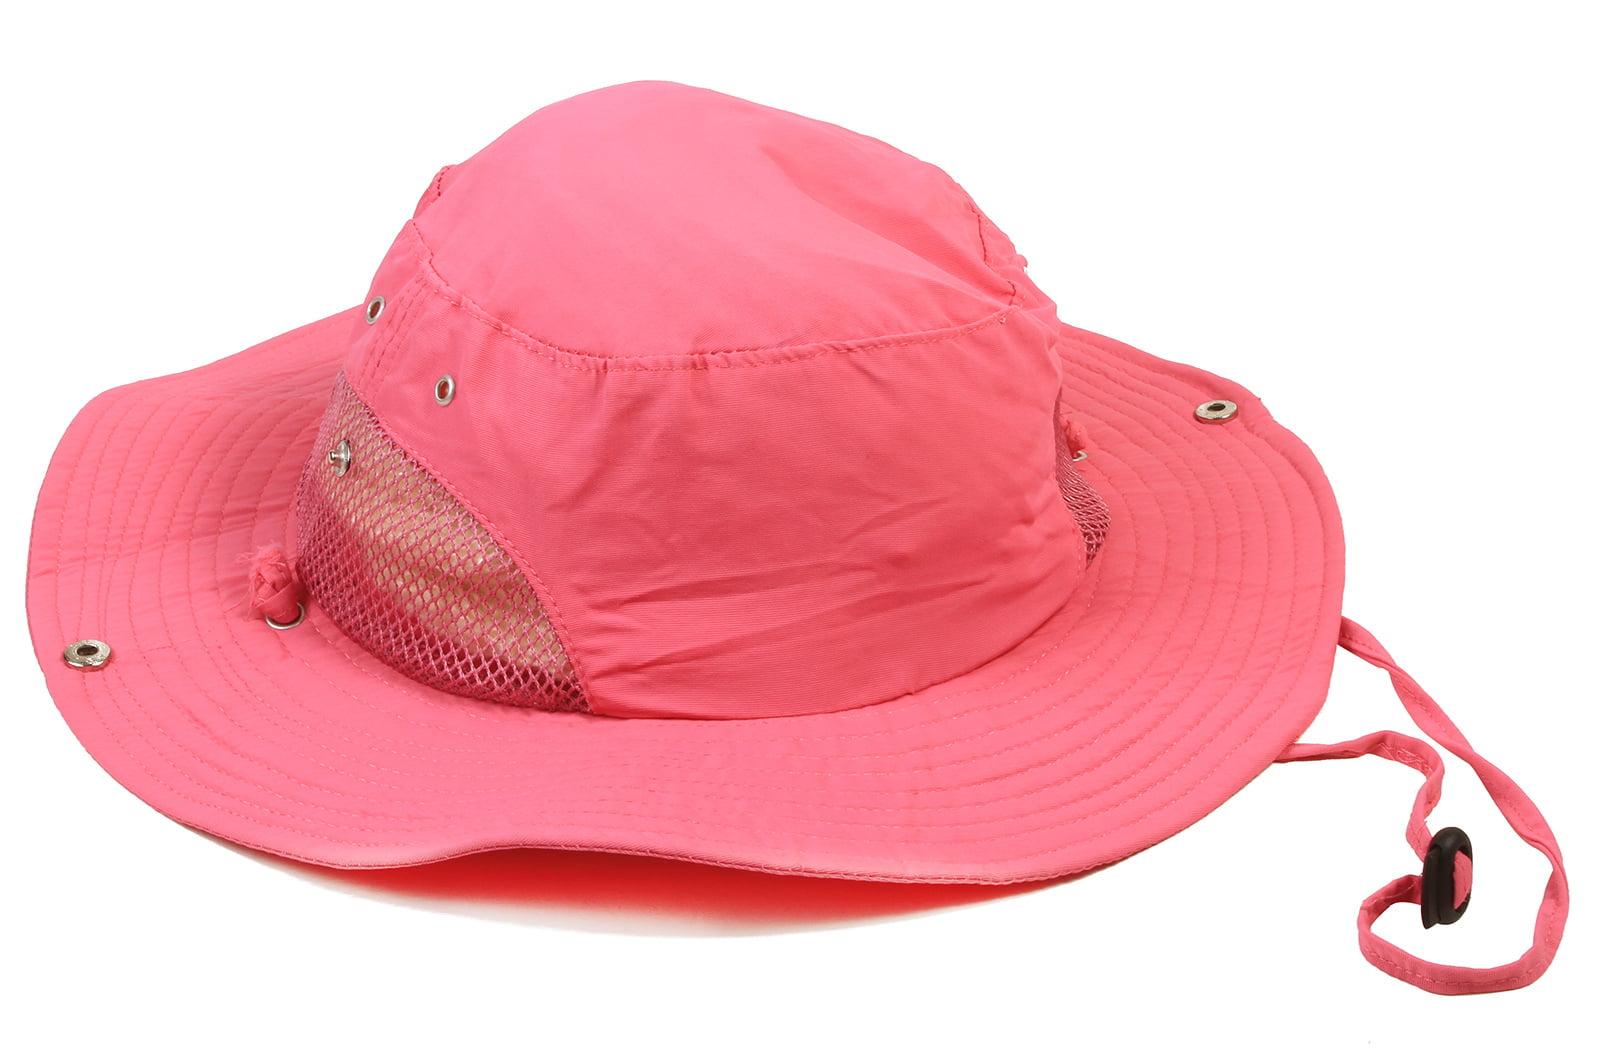 23775ffd Simplicity Unisex Safari Outback SPF 50 UV Protection Foldable Sun Hat,Navy  - Walmart.com